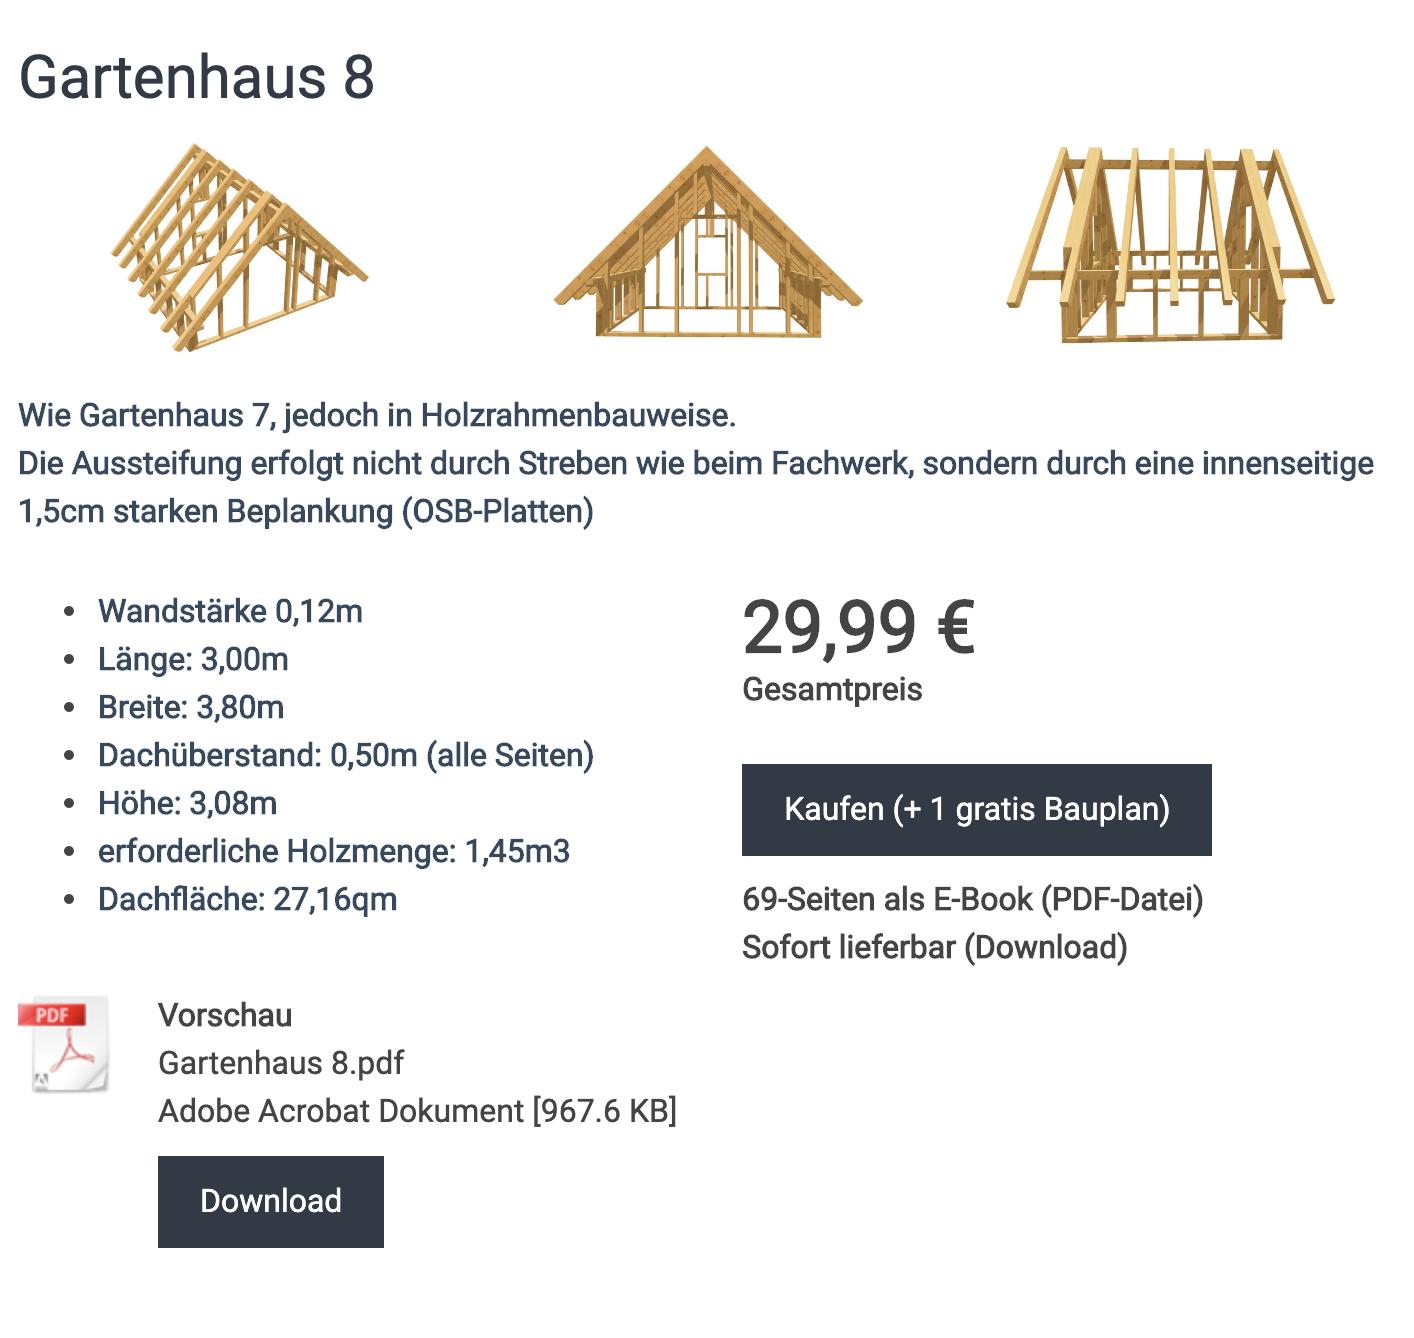 Bauplan Gartenhaus 8